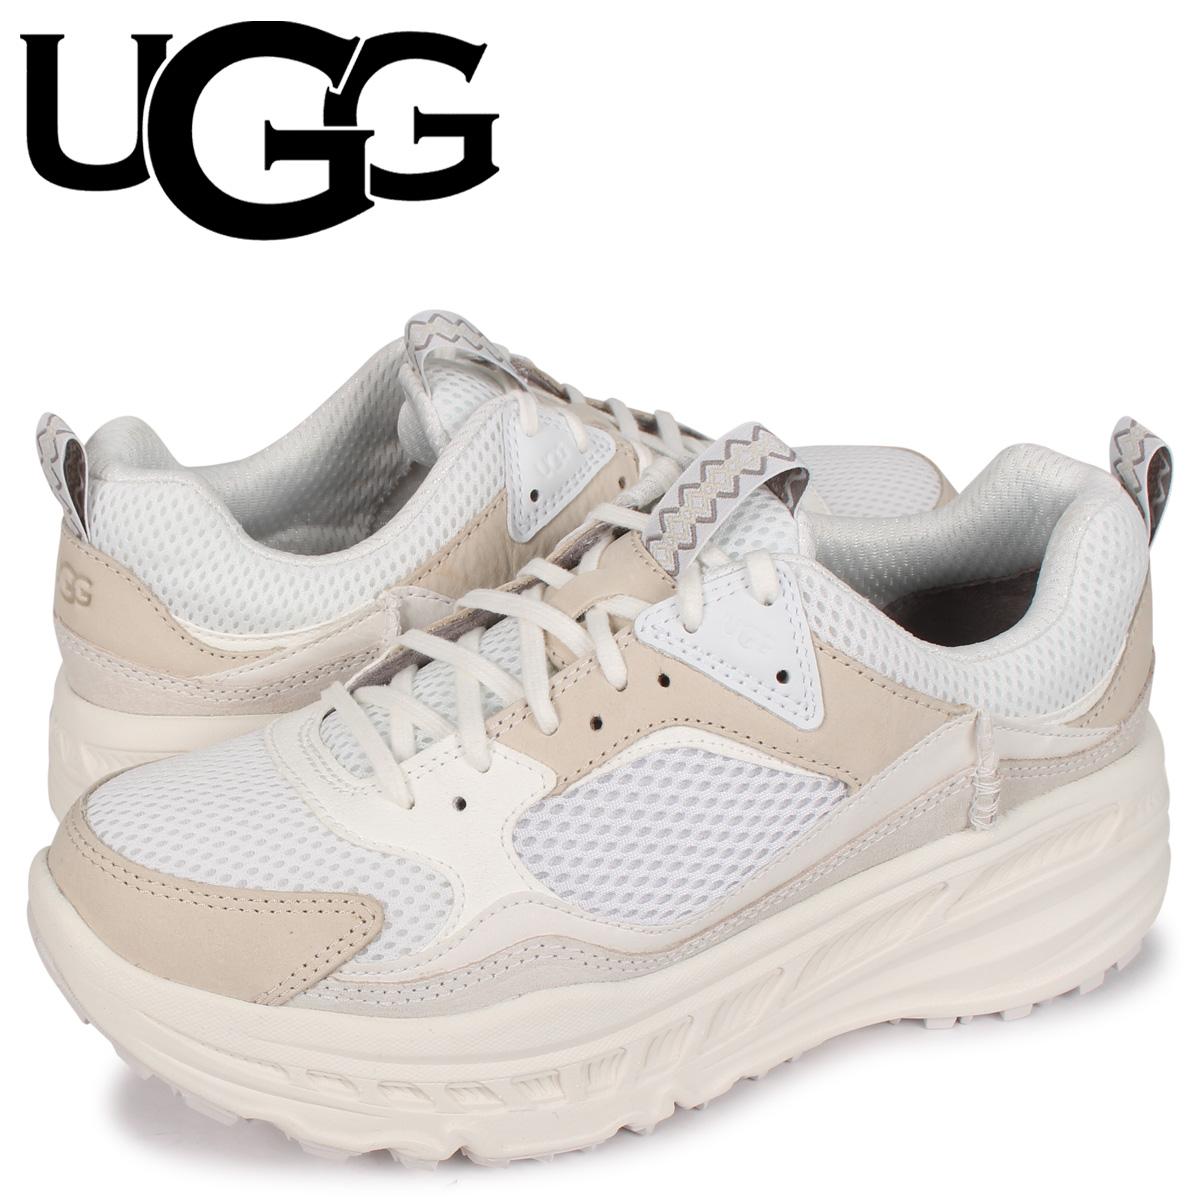 UGG アグ スニーカー メッシュ メンズ レディース CA805 MESH ホワイト 白 1108037 [3/19 新入荷]